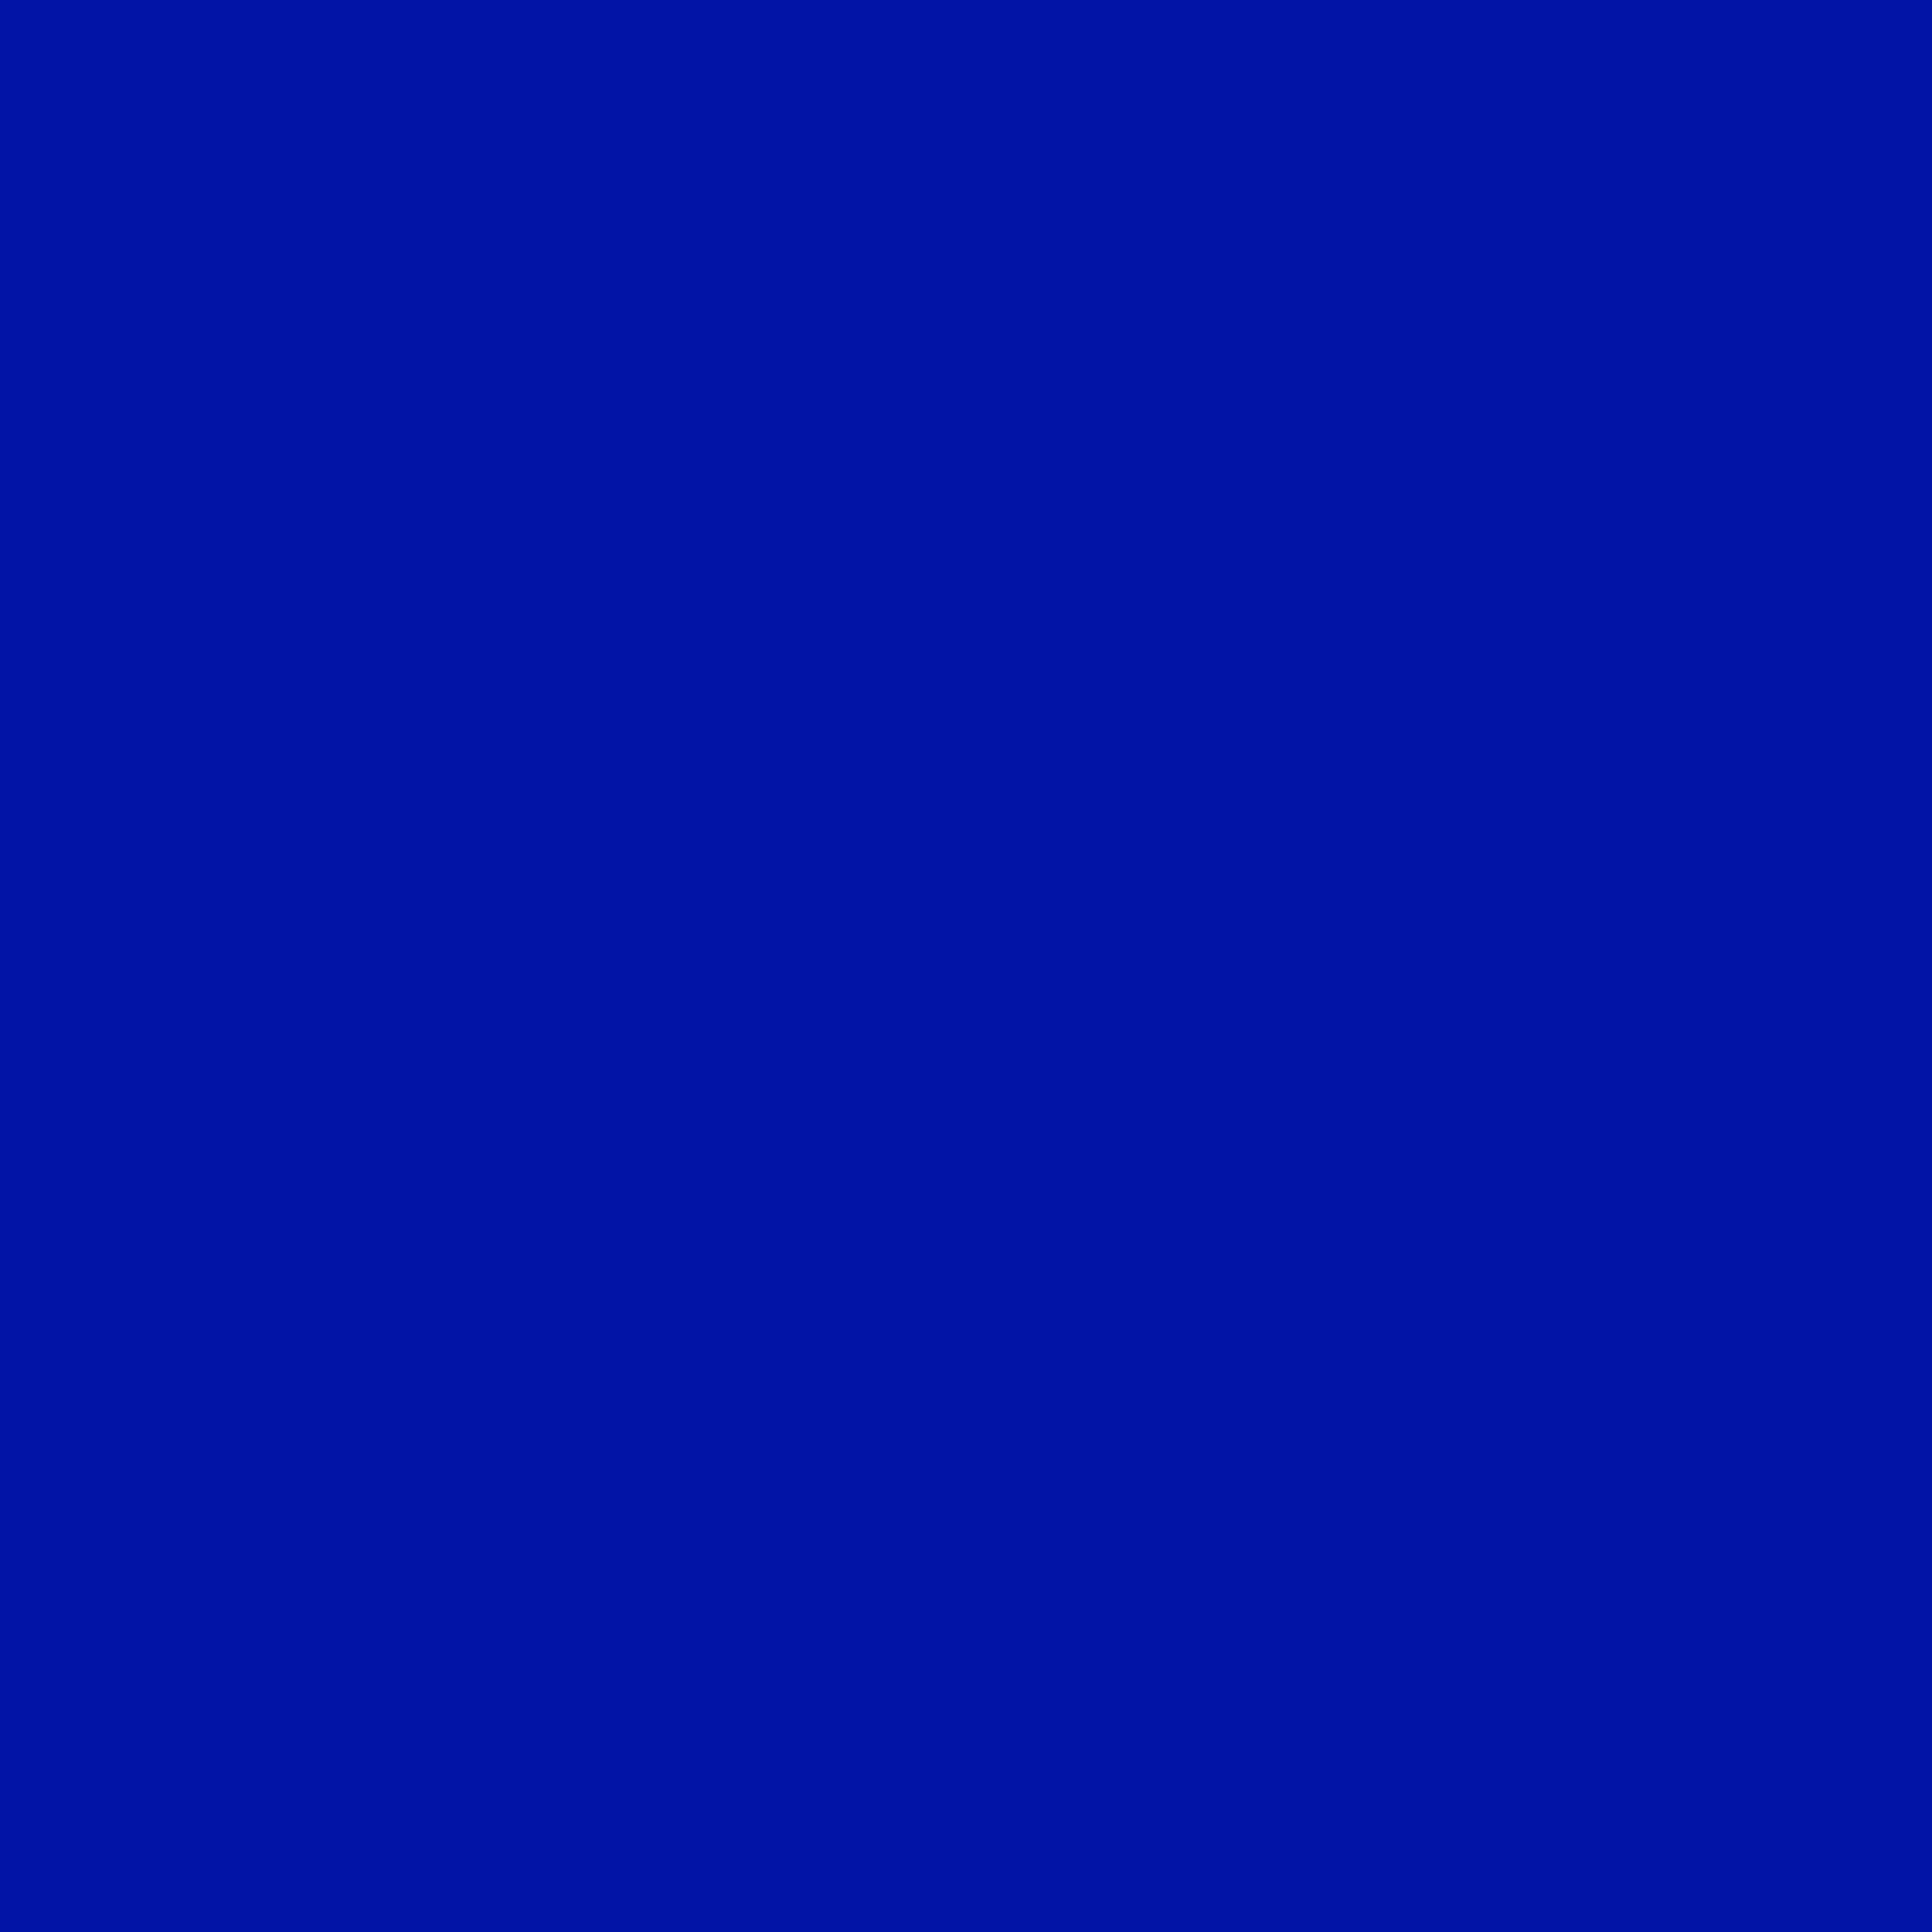 2732x2732 Zaffre Solid Color Background